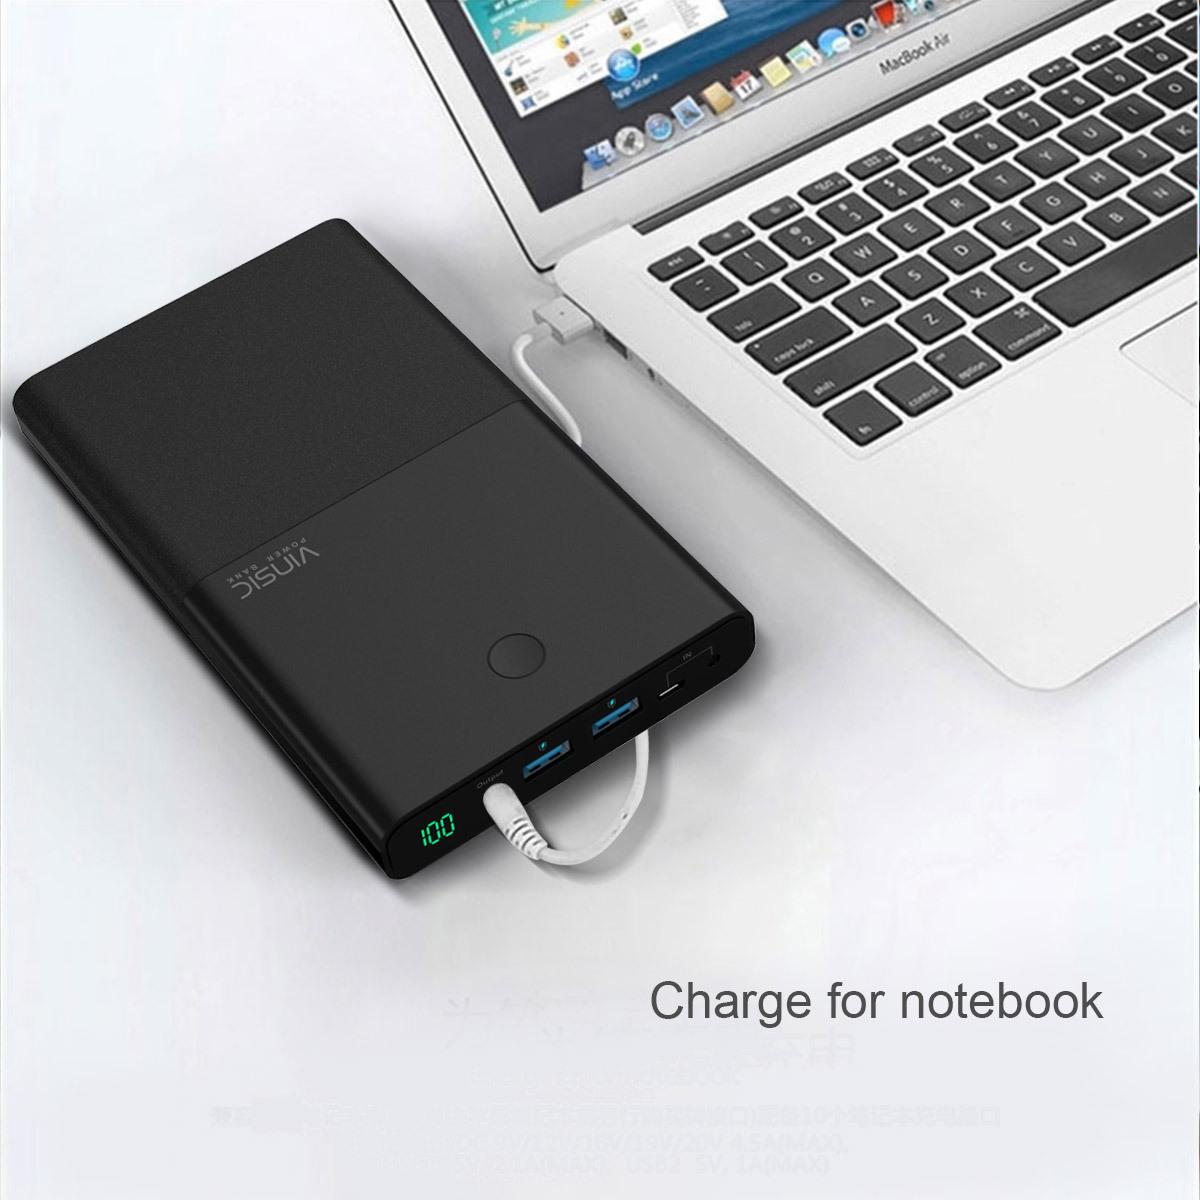 vinsic dual usb power bank 30000mah phone charger for. Black Bedroom Furniture Sets. Home Design Ideas